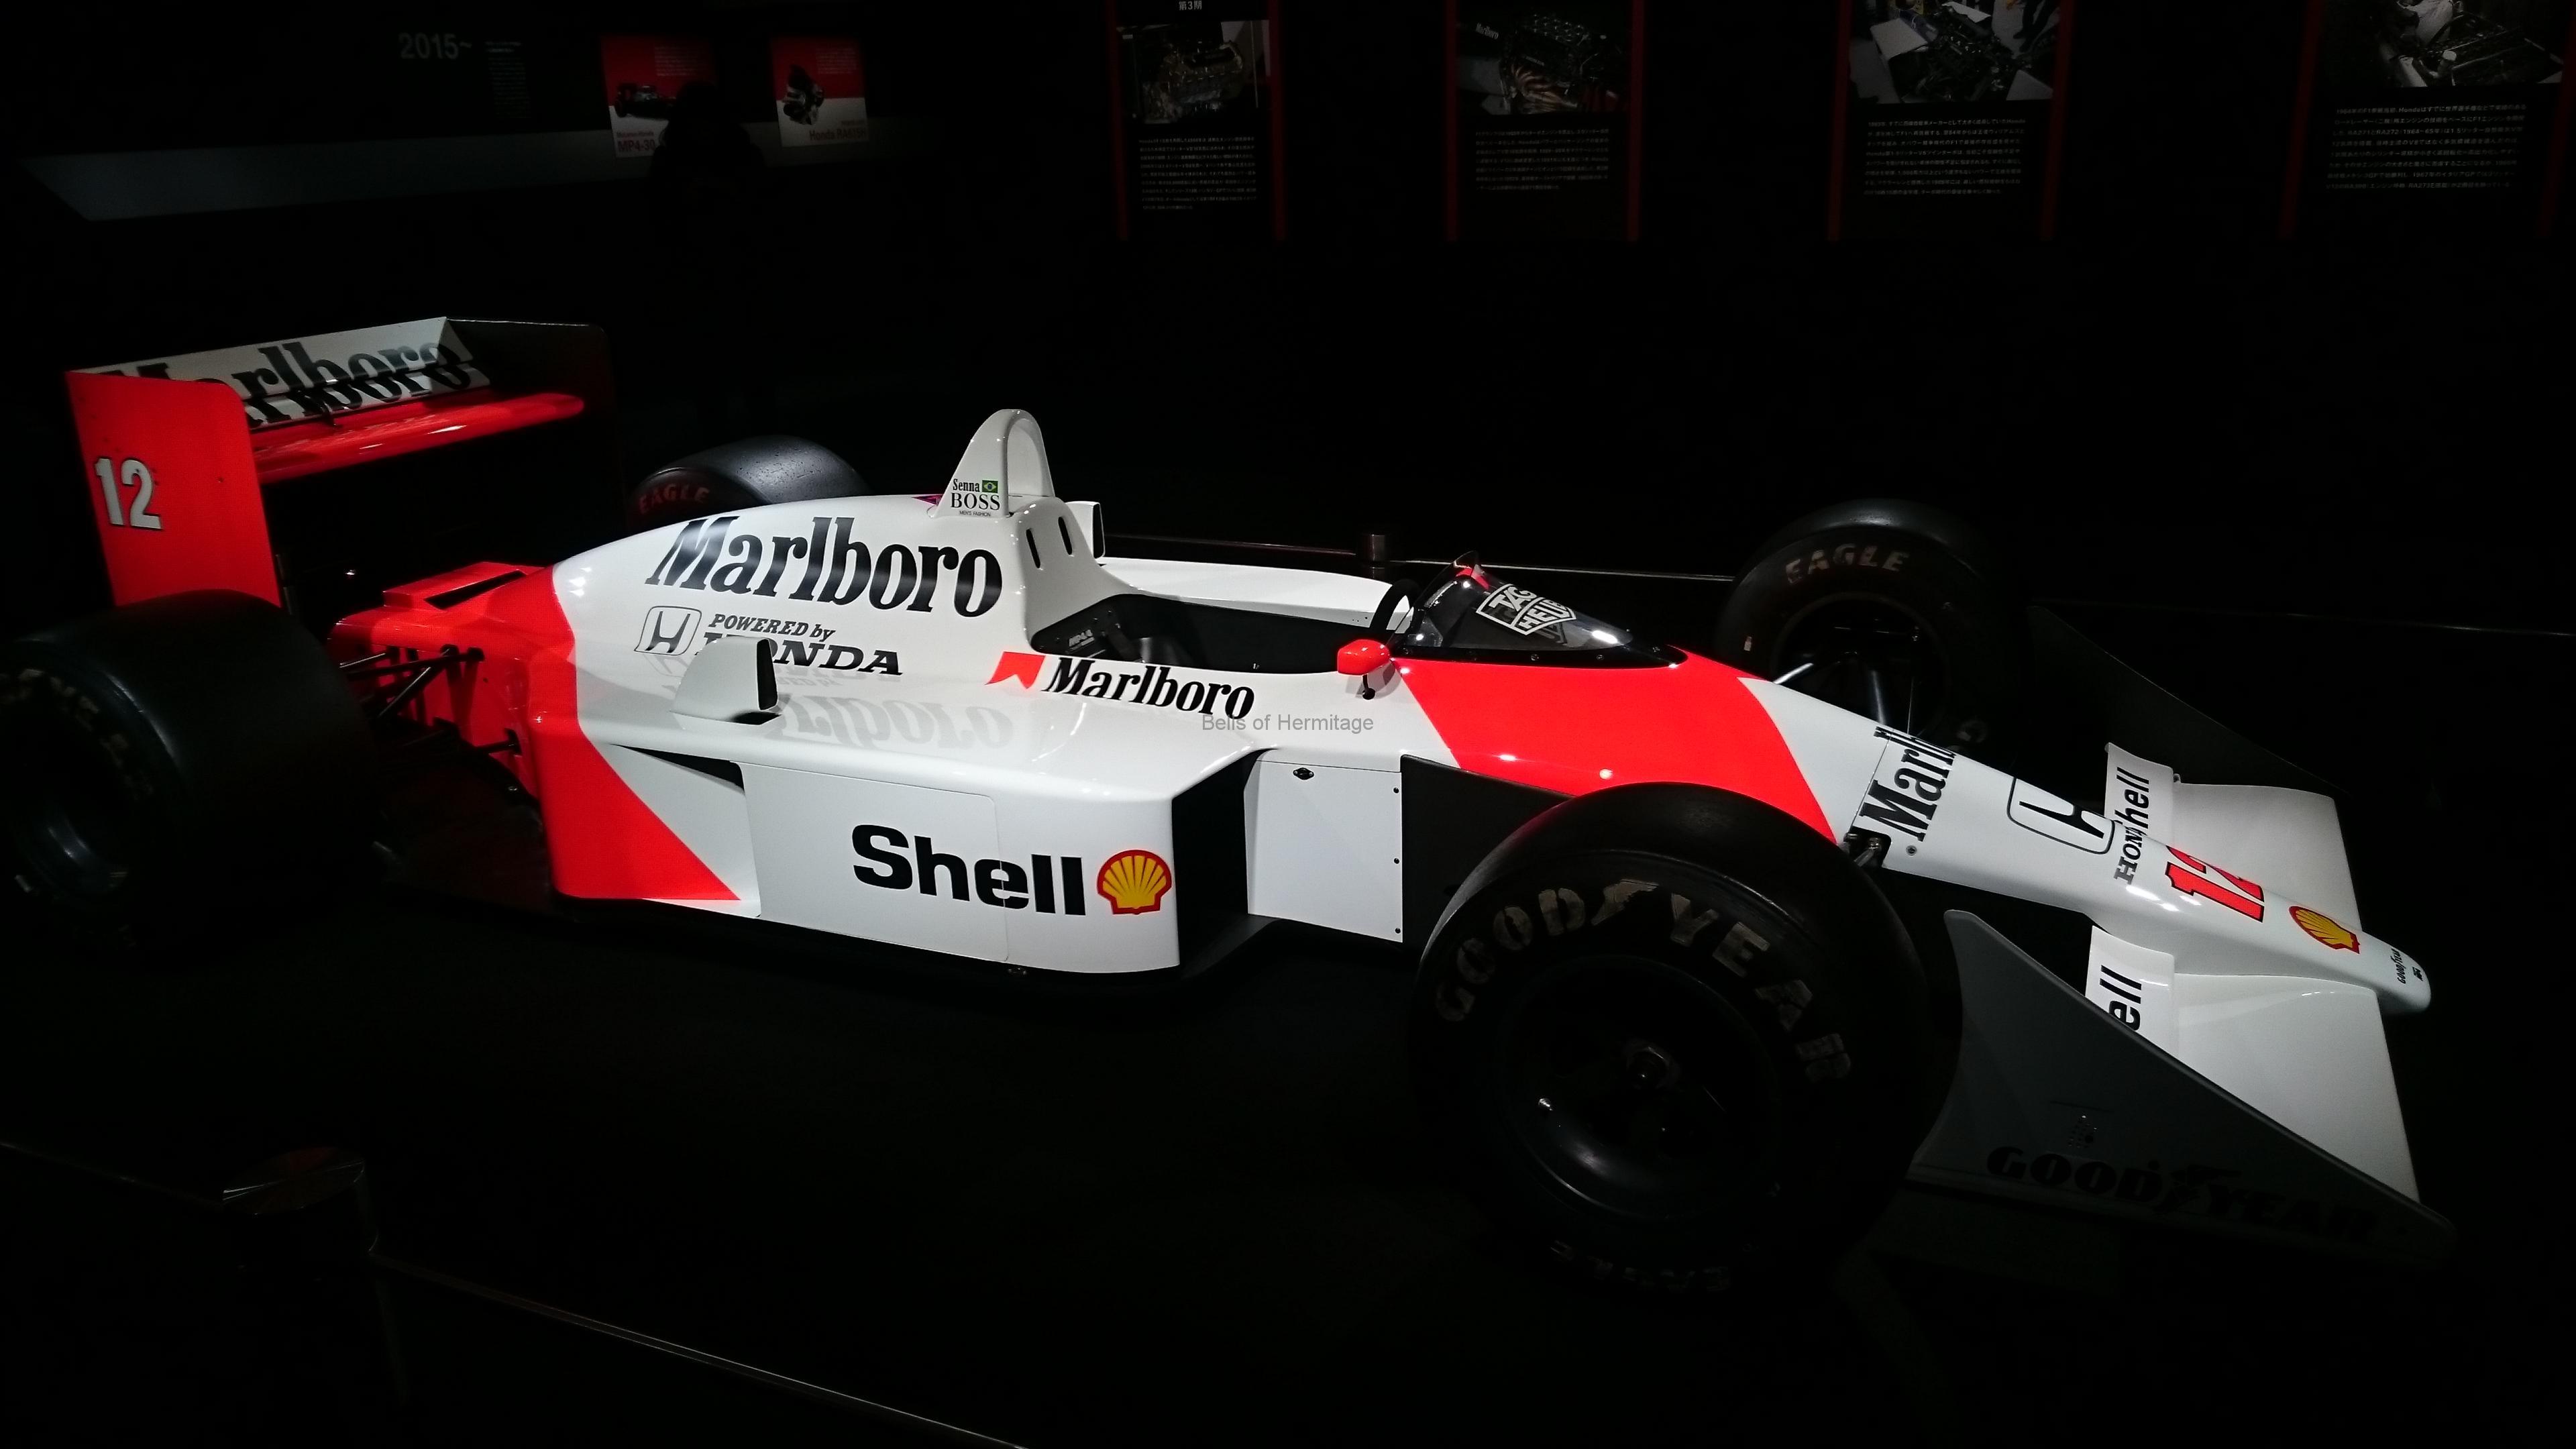 F1へ誘われたキッカケ~新世紀GPXサイバーフォーミュラ Blu-ray&メガハウス製のヴァリアブルアクションシリーズ